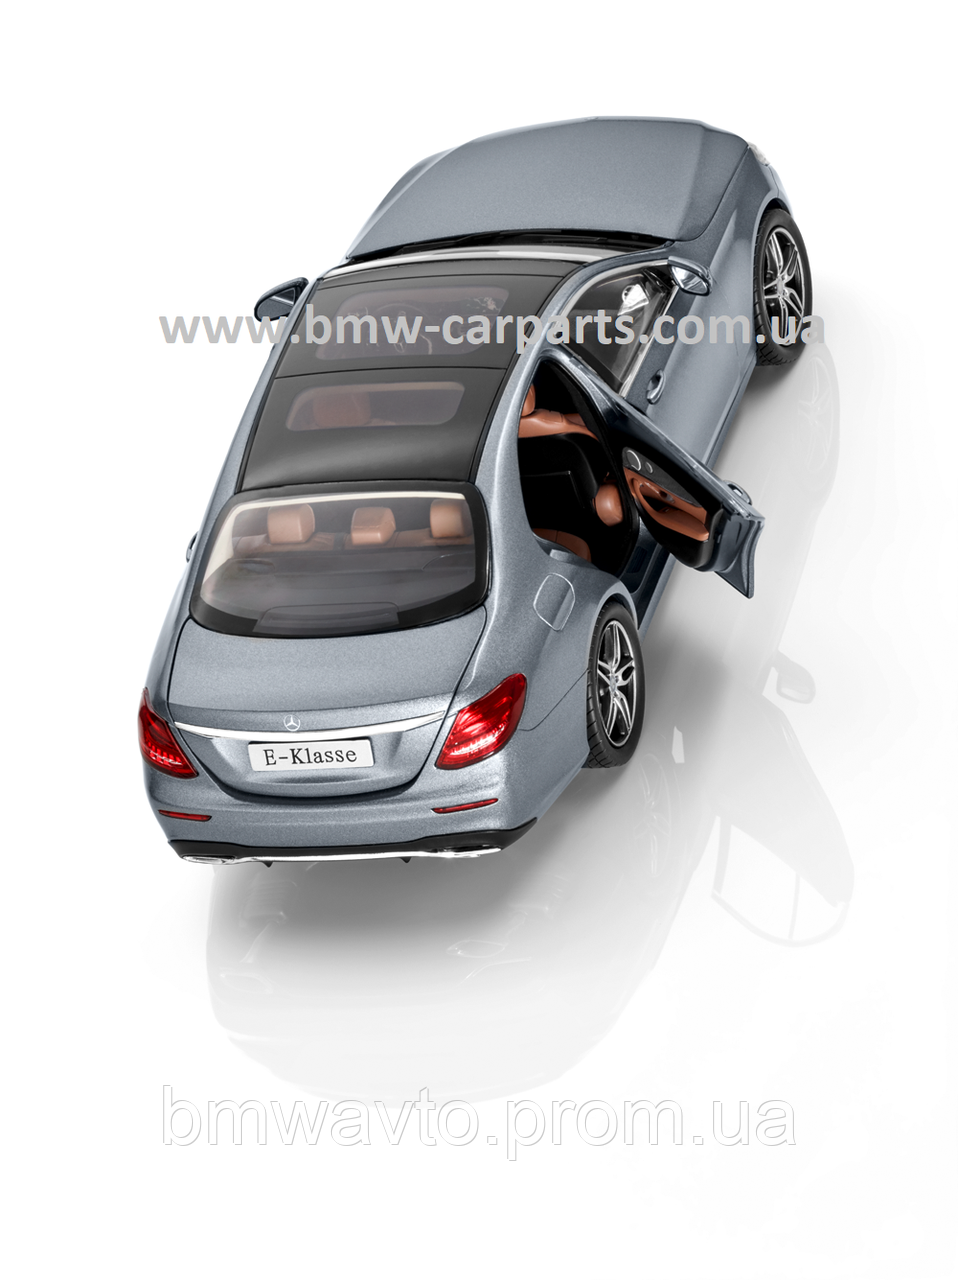 Модель Mercedes-Benz E-Class, AMG Line, Designo Selenite Grey Magno, 1:18 Scale